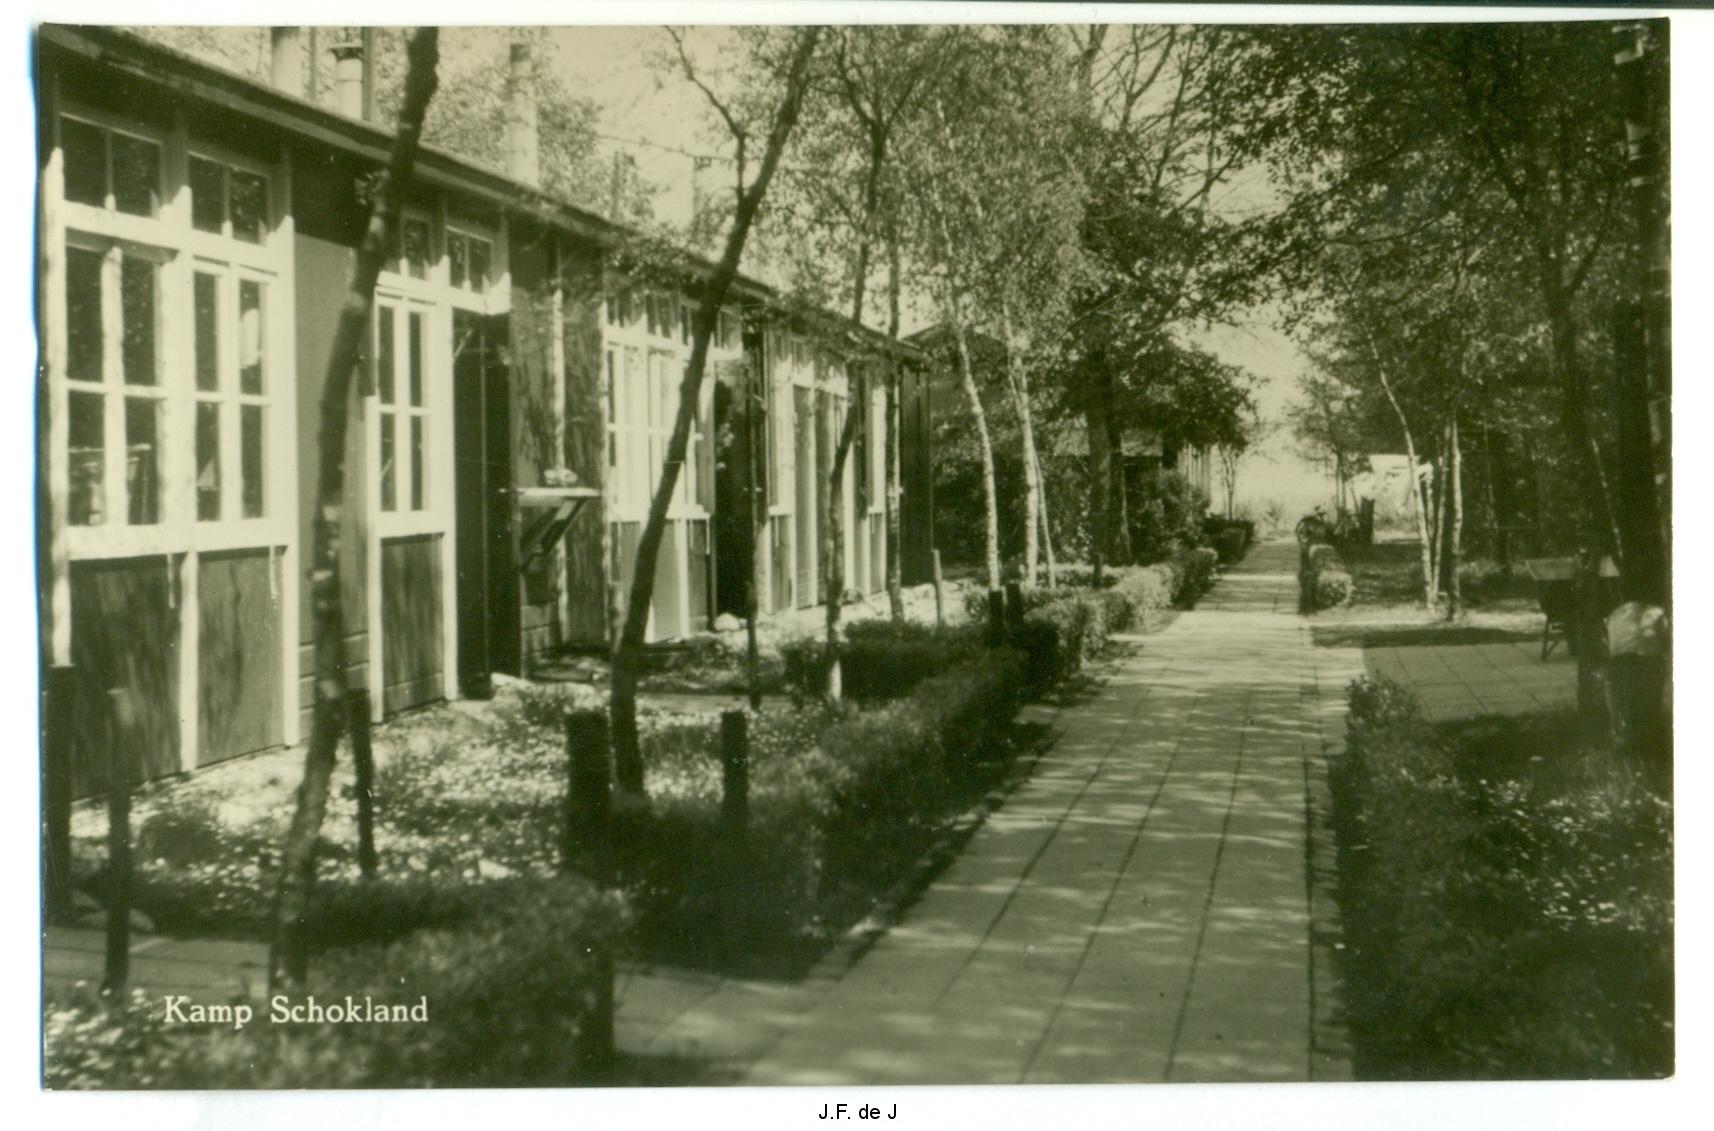 Kamp Schokland